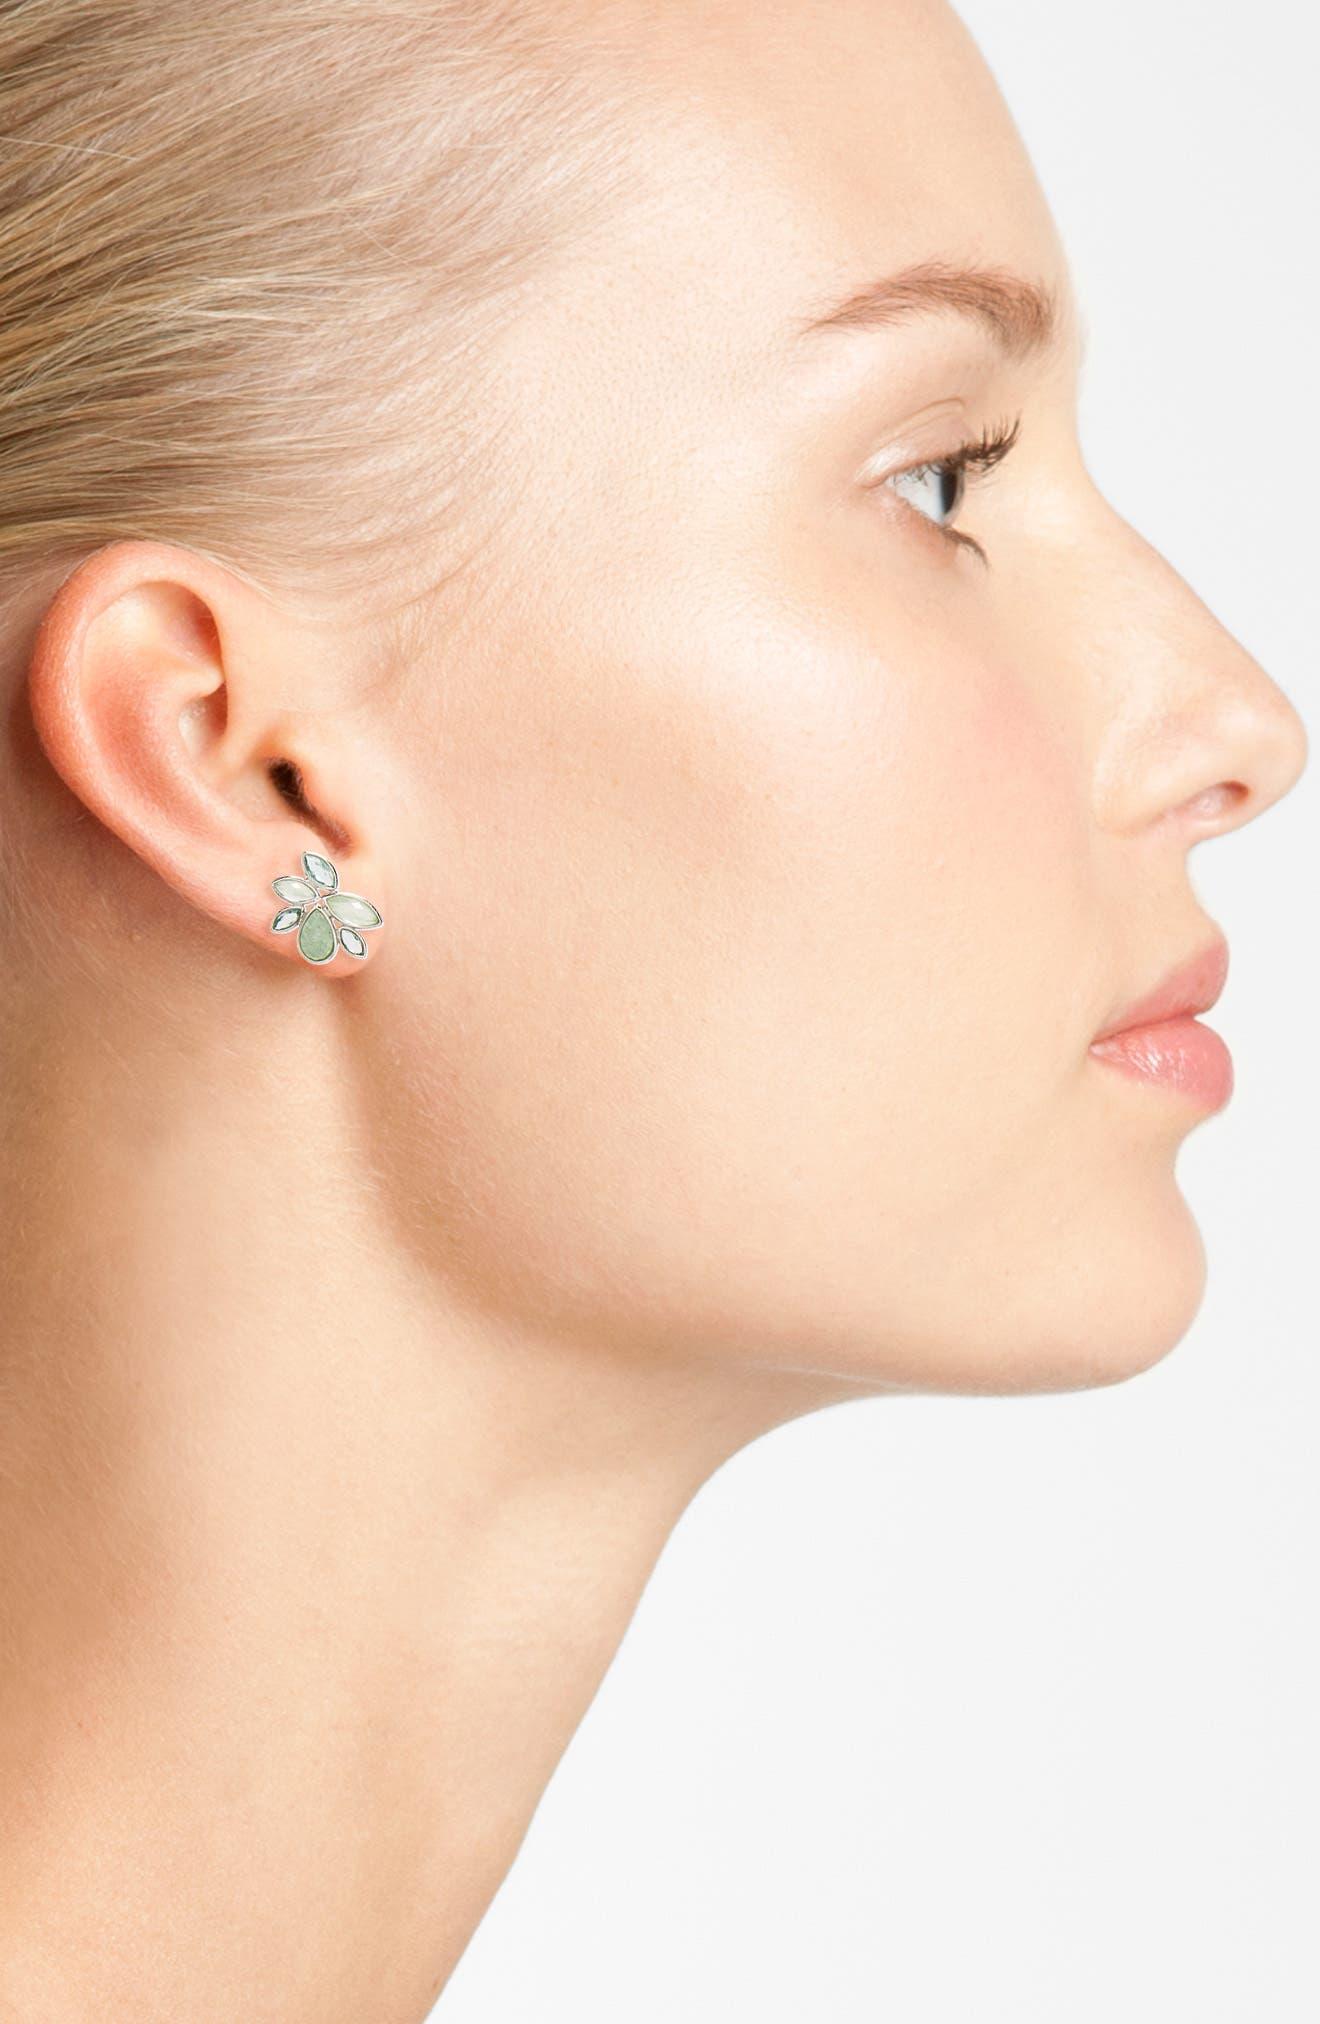 Lakeside Stud Earrings,                             Alternate thumbnail 2, color,                             300